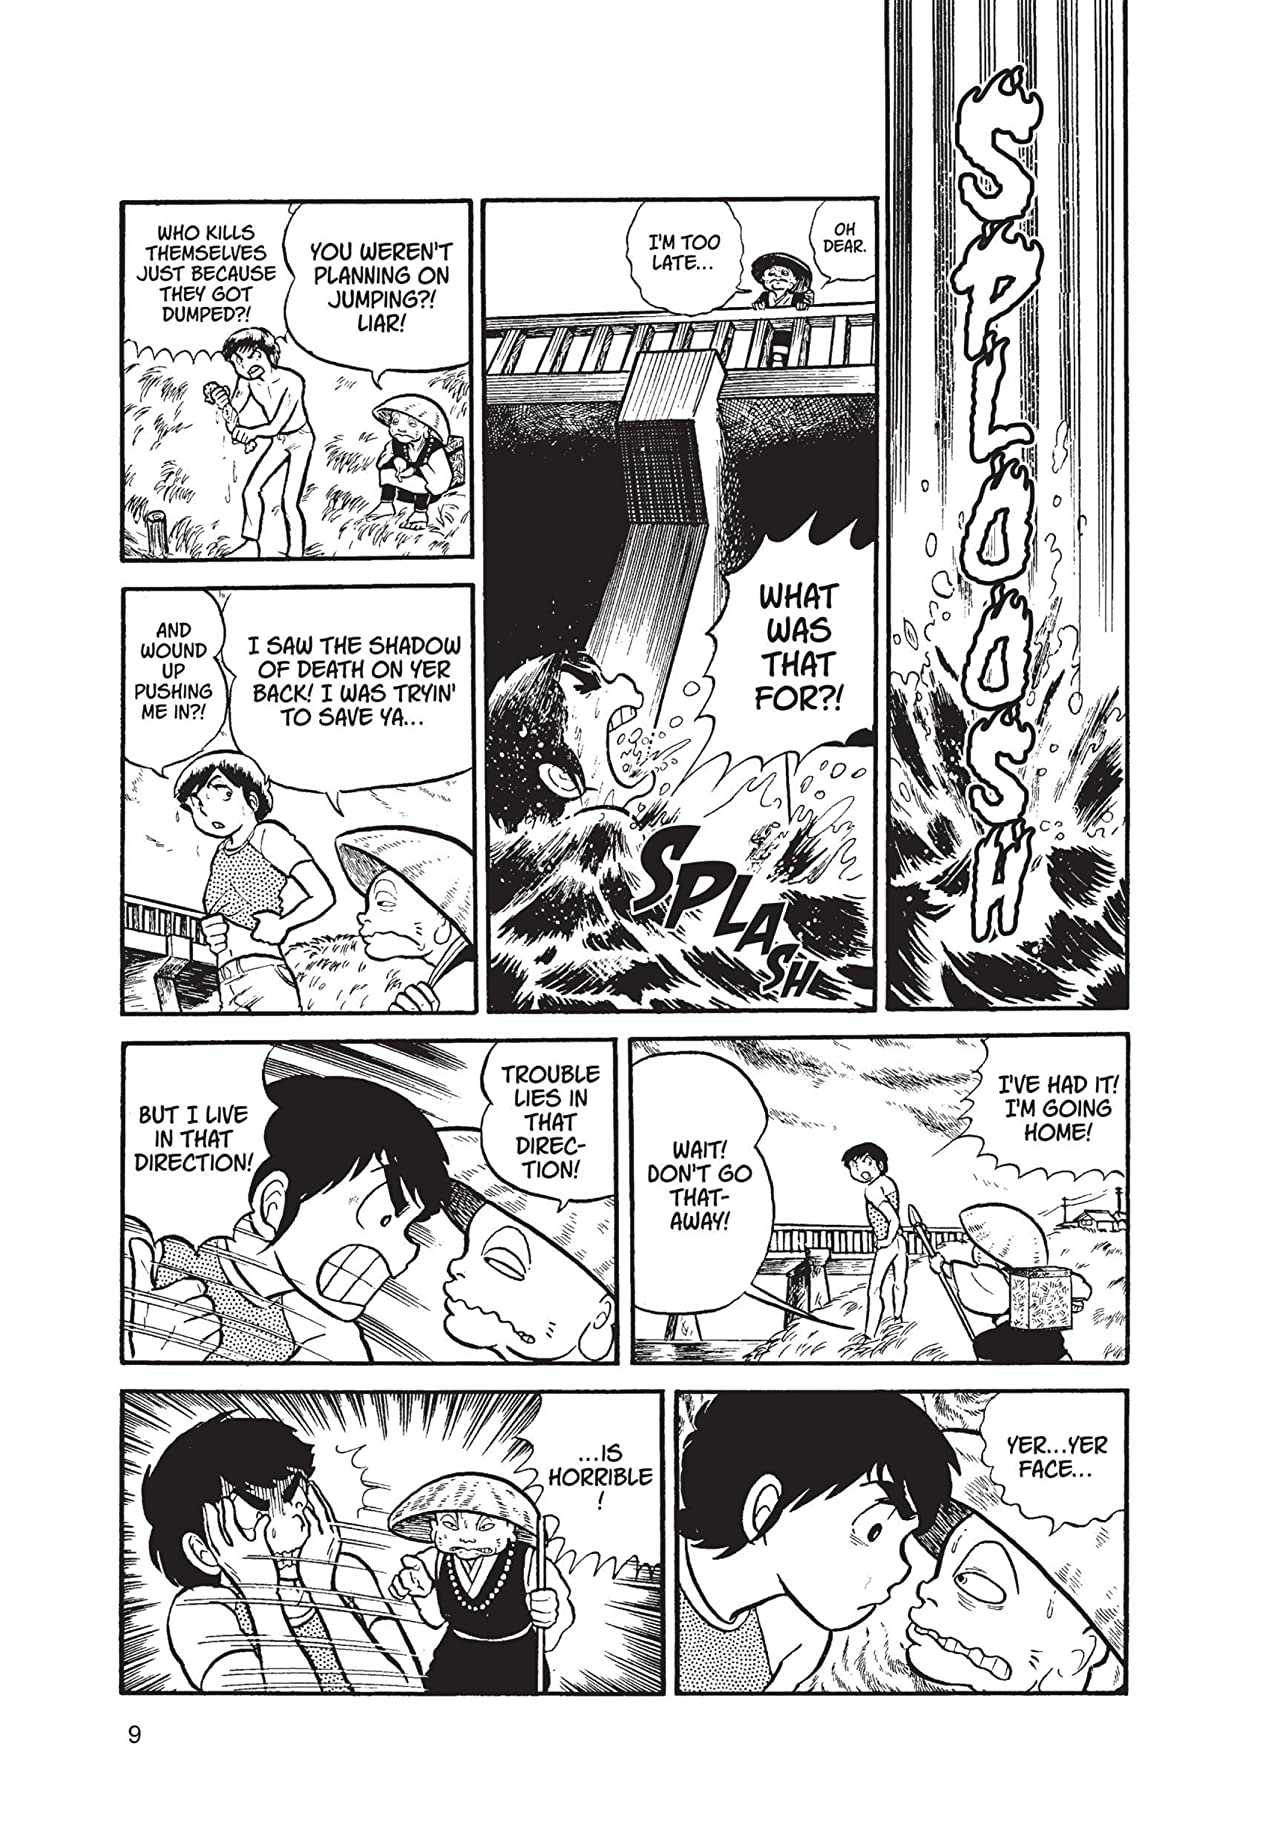 Urusei Yatsura Vol. 1